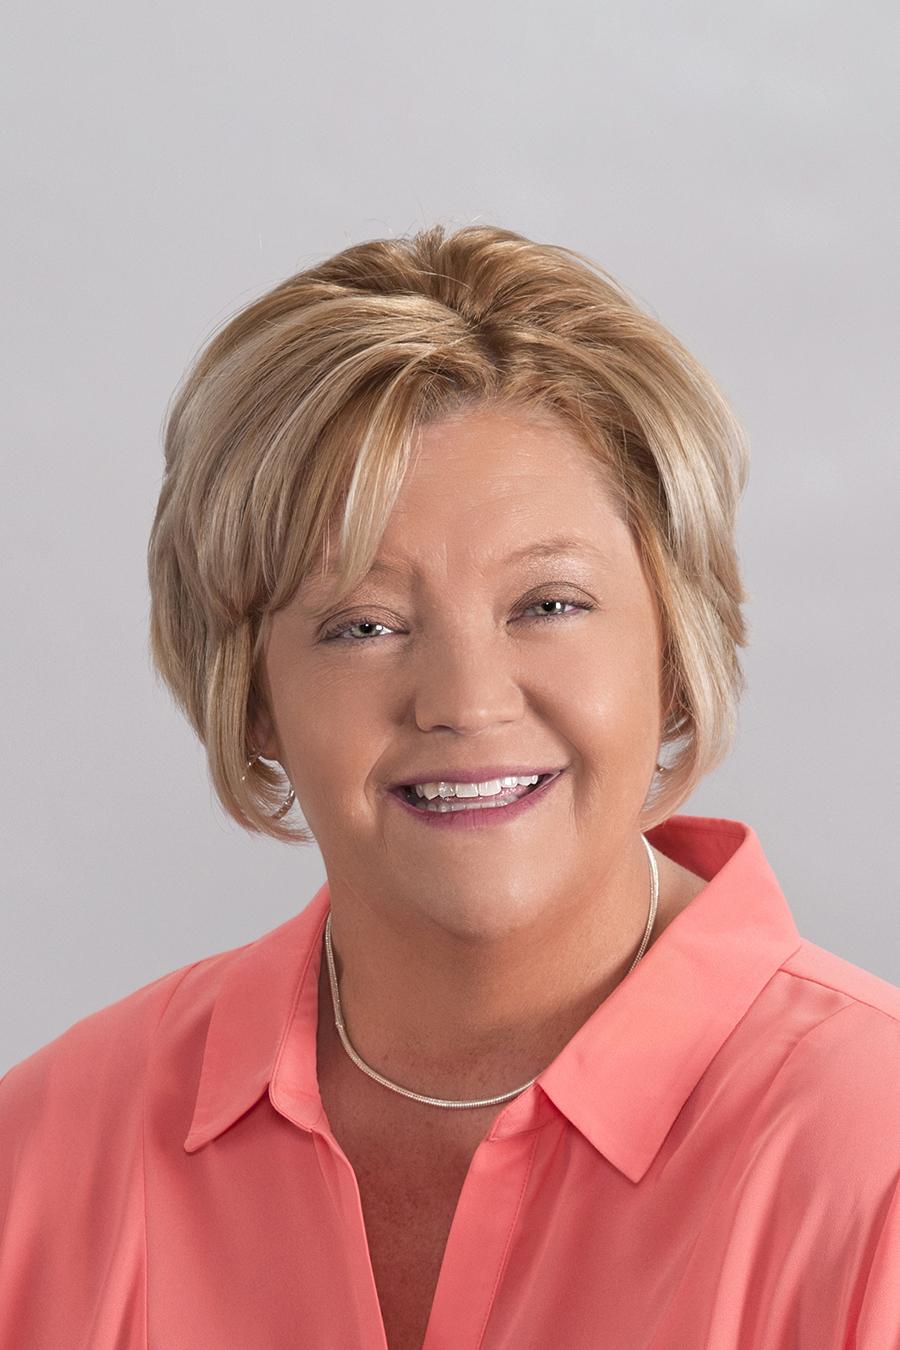 Lynn Hathcock